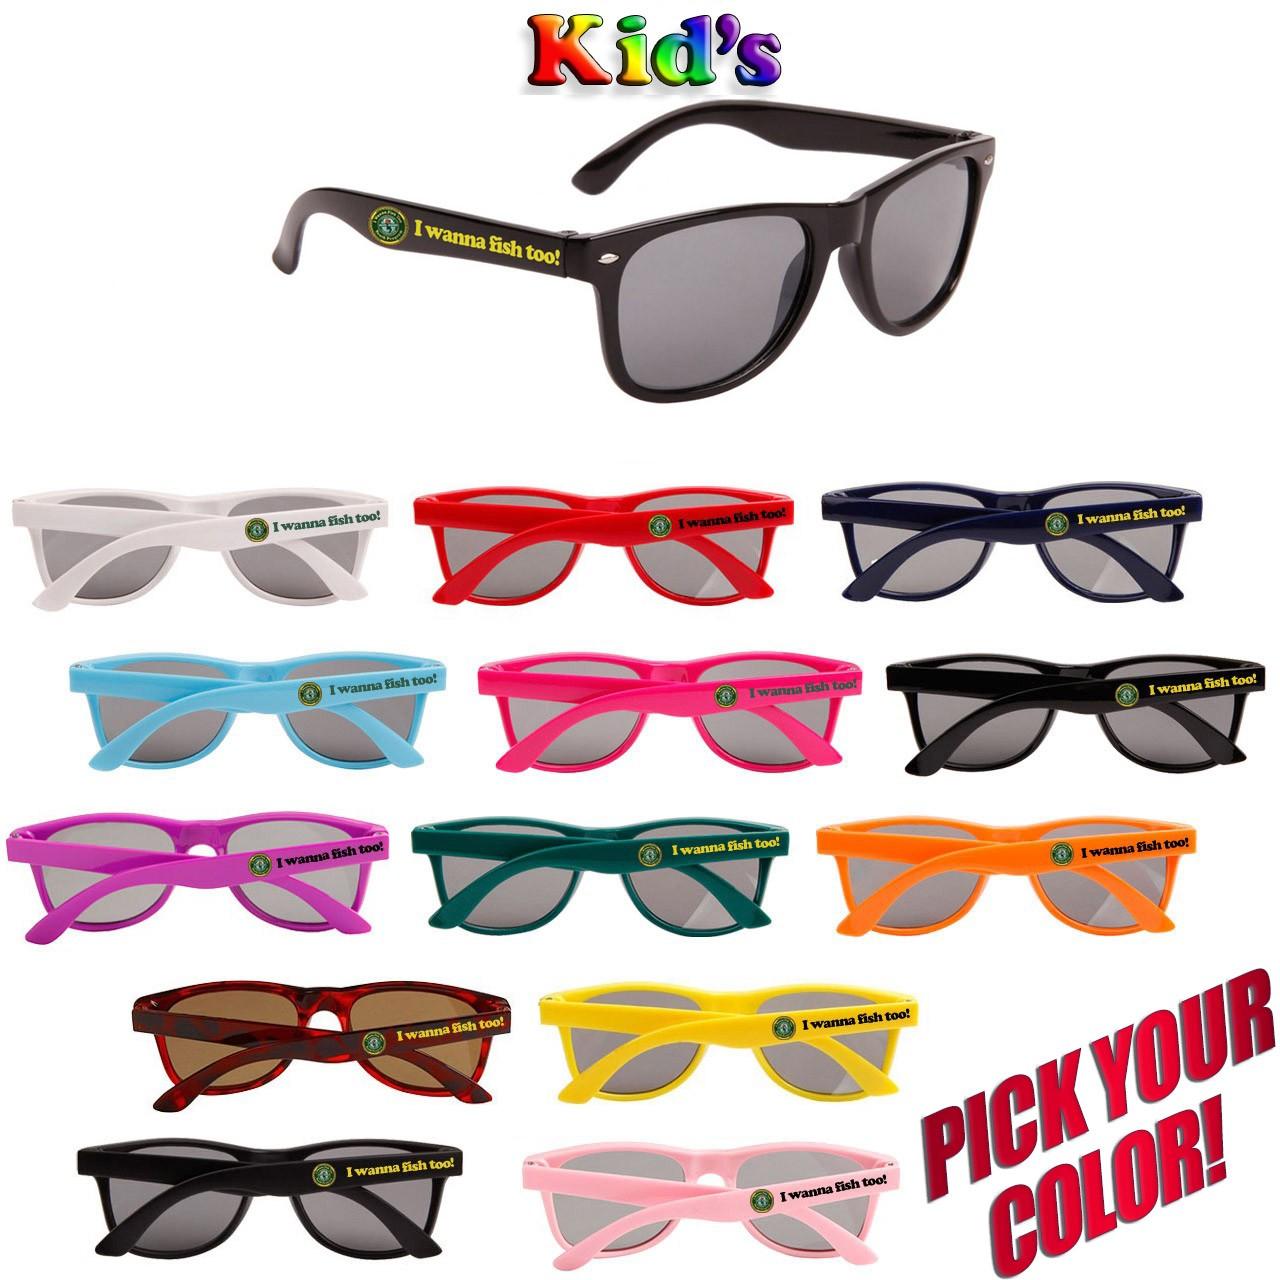 Custom Printed Kid's Classic Sunglasses